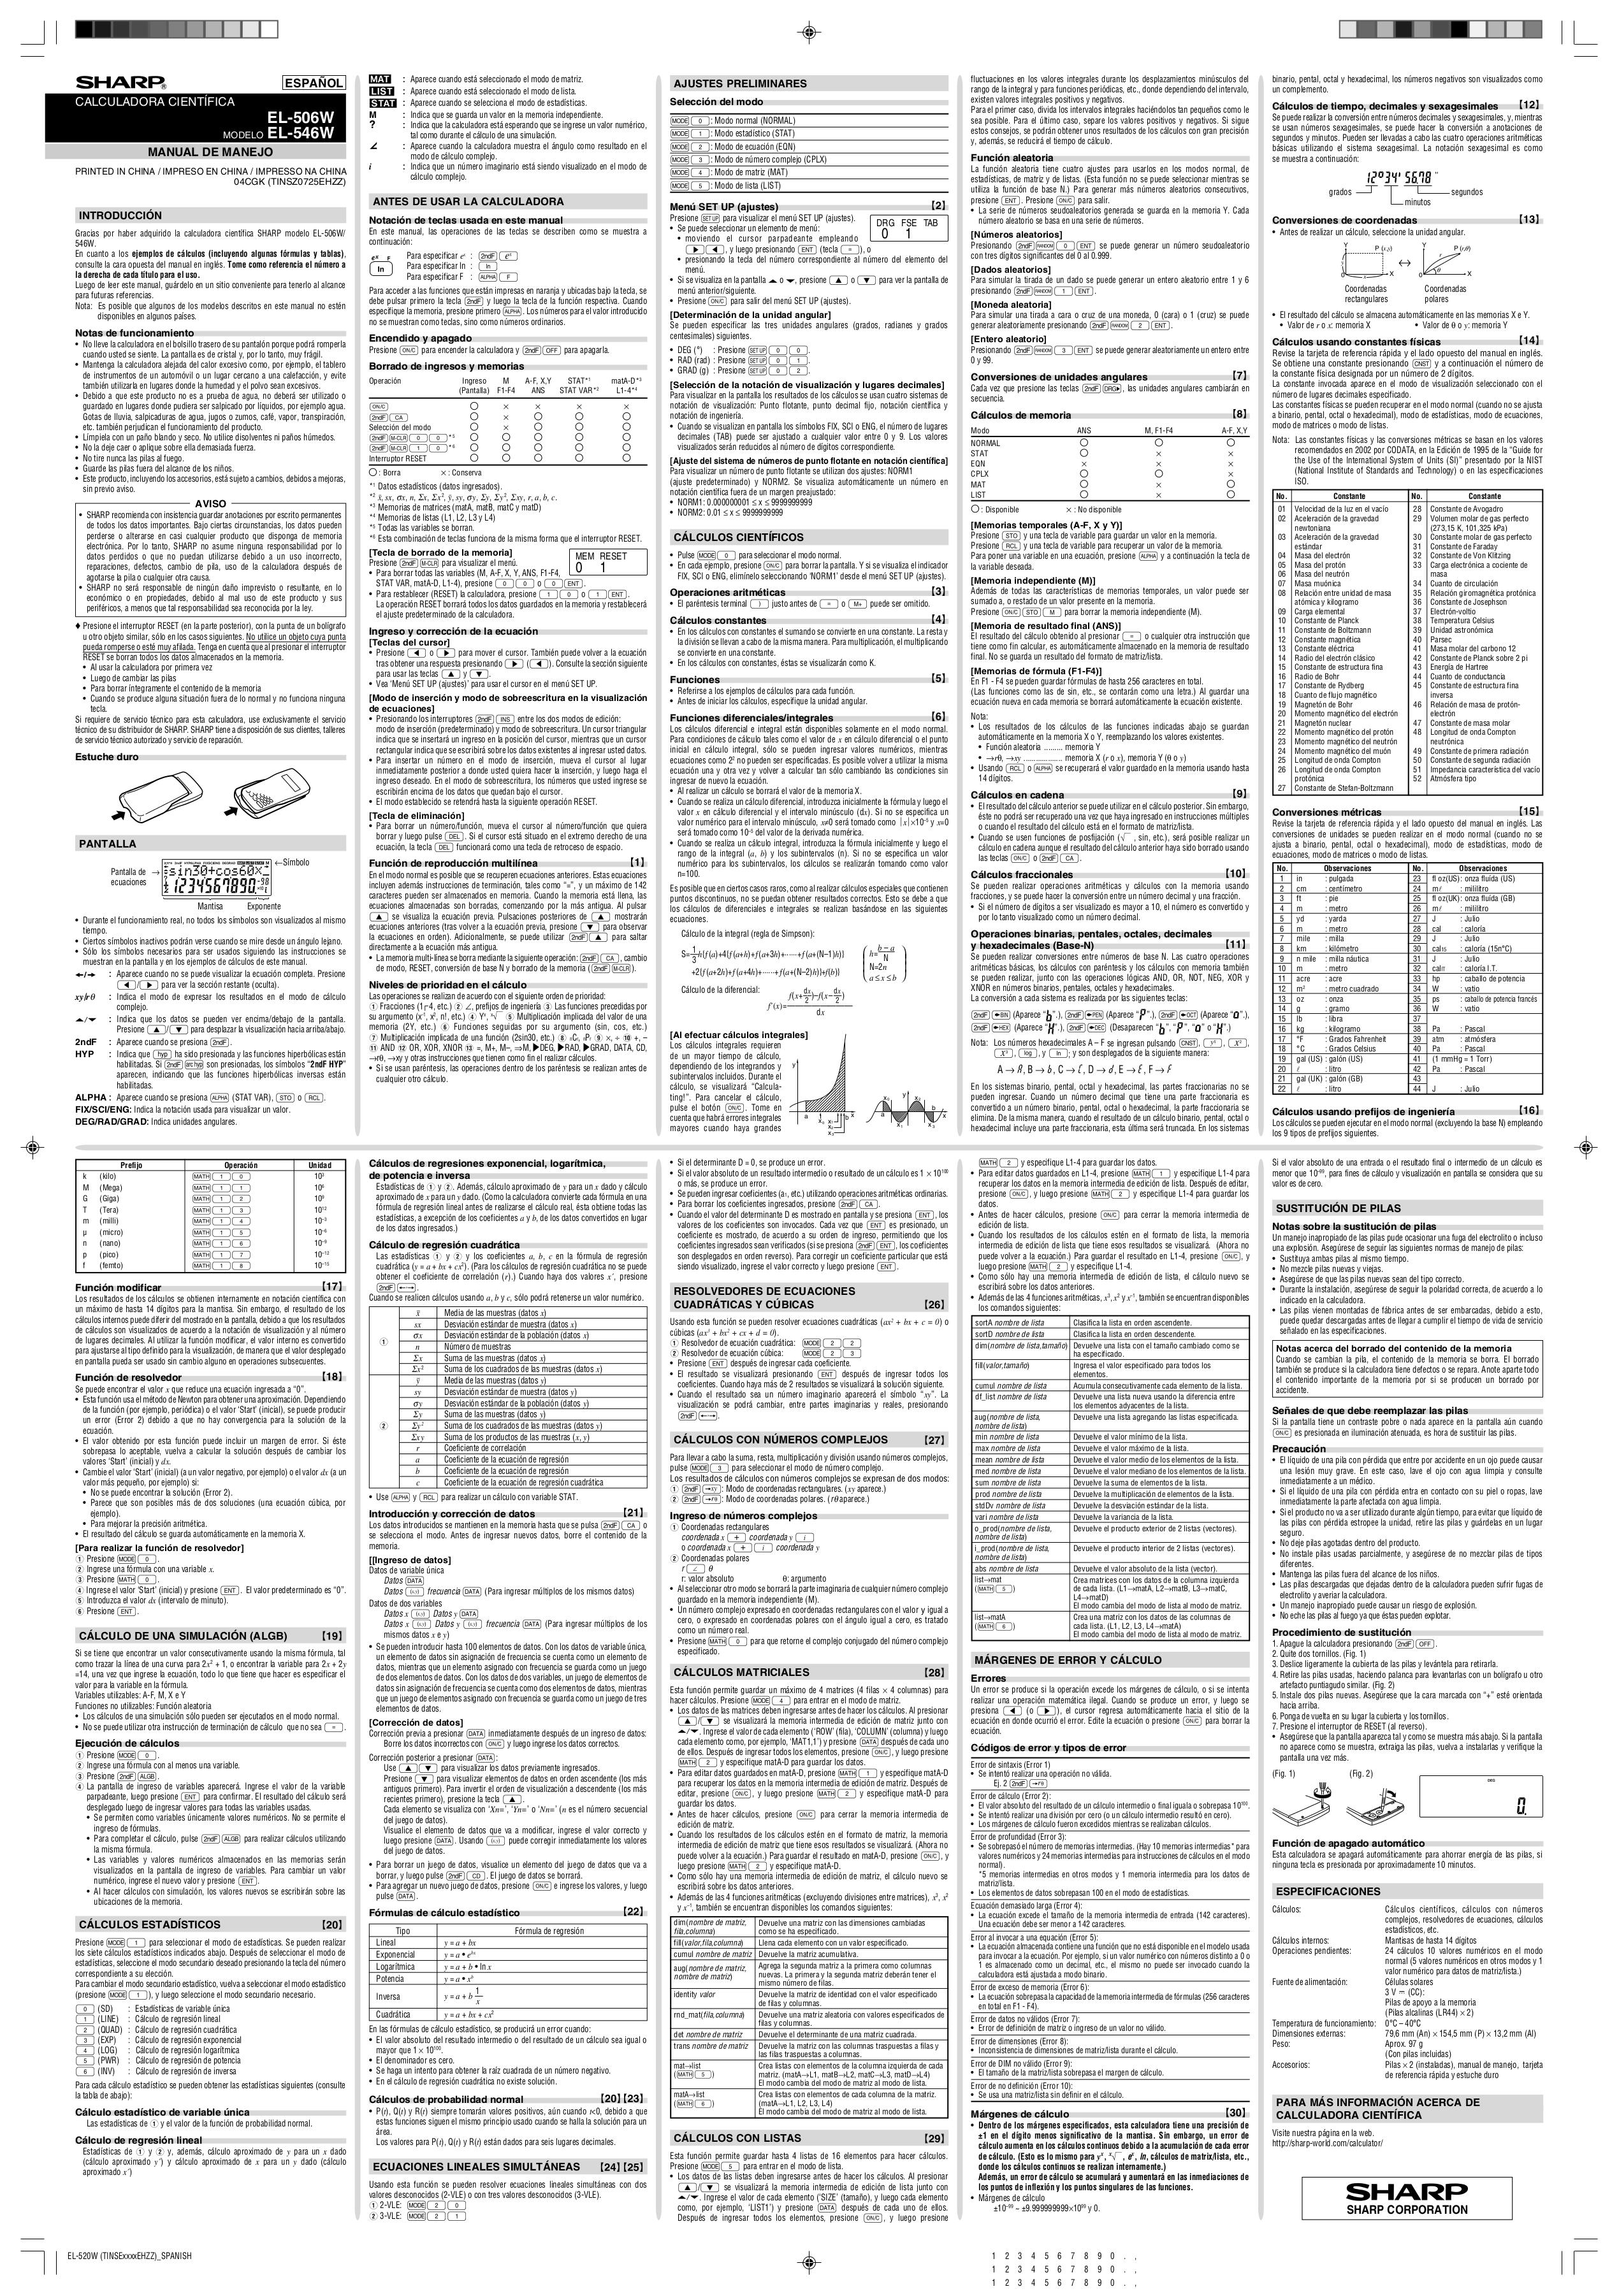 download free pdf for sharp el 506w calculator manual rh umlib com Sharp EL -2630PIII Calculator Sharp EL Printing Calculator 1630